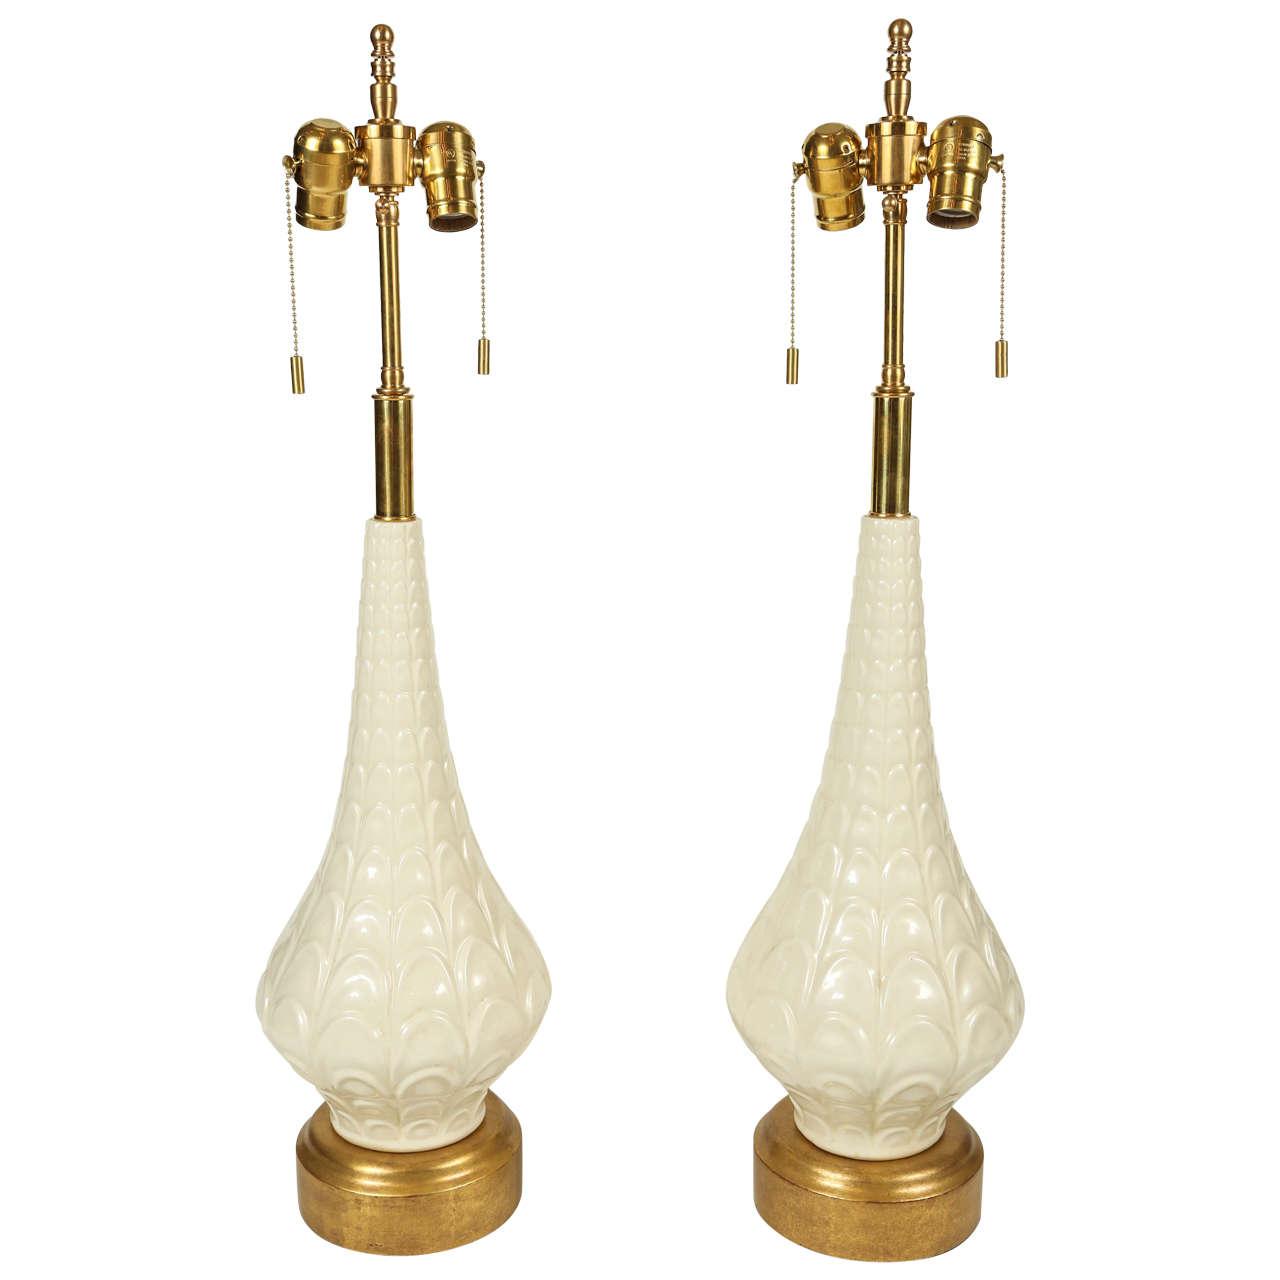 Danish Mid-Century Modern Pottery Lamps